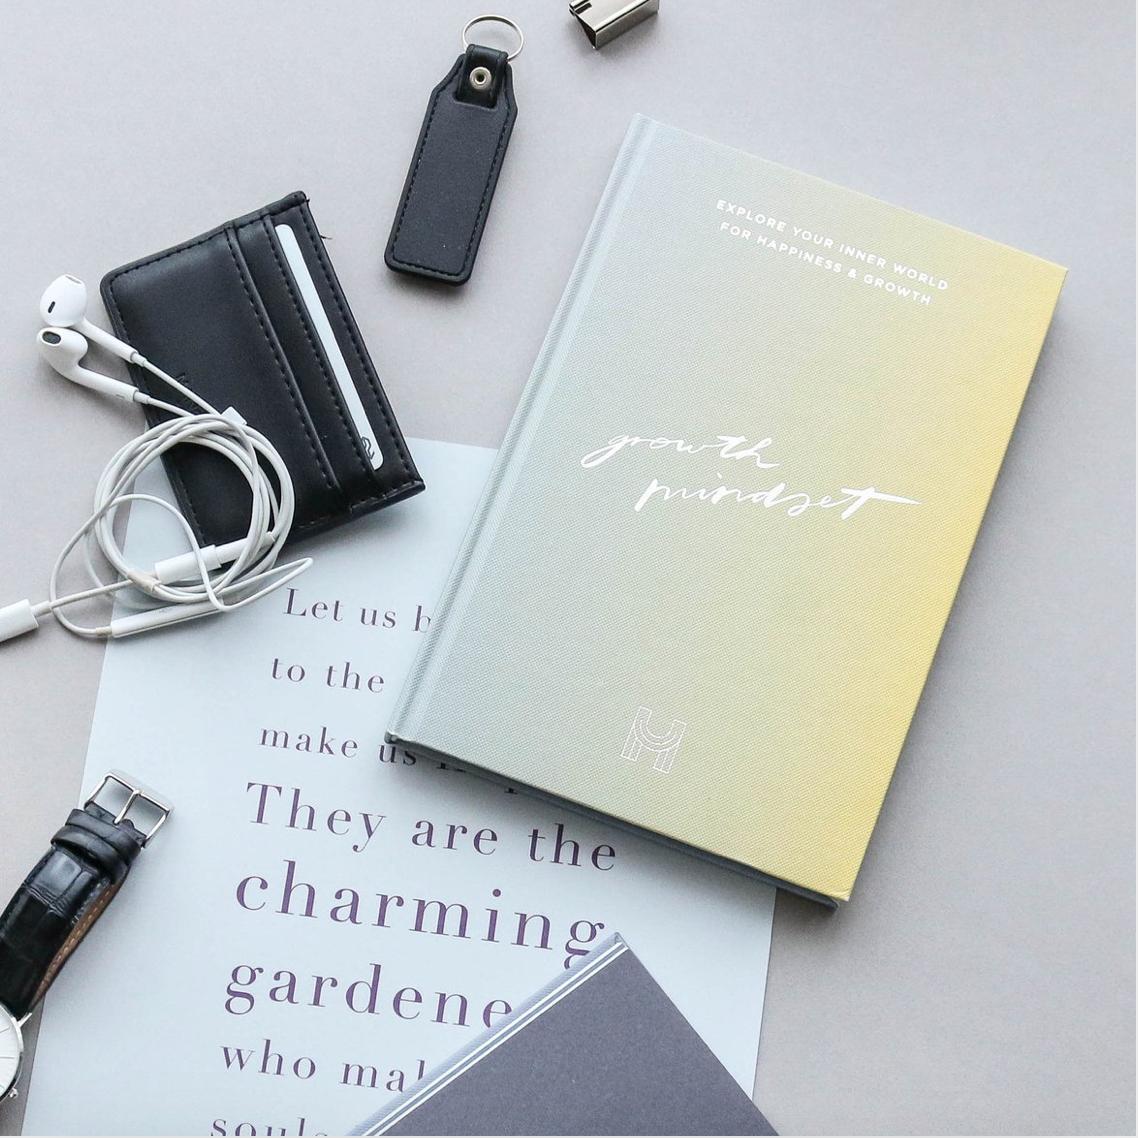 Growth Mindset Journal - EXPLORE YOUR INNER WORLD